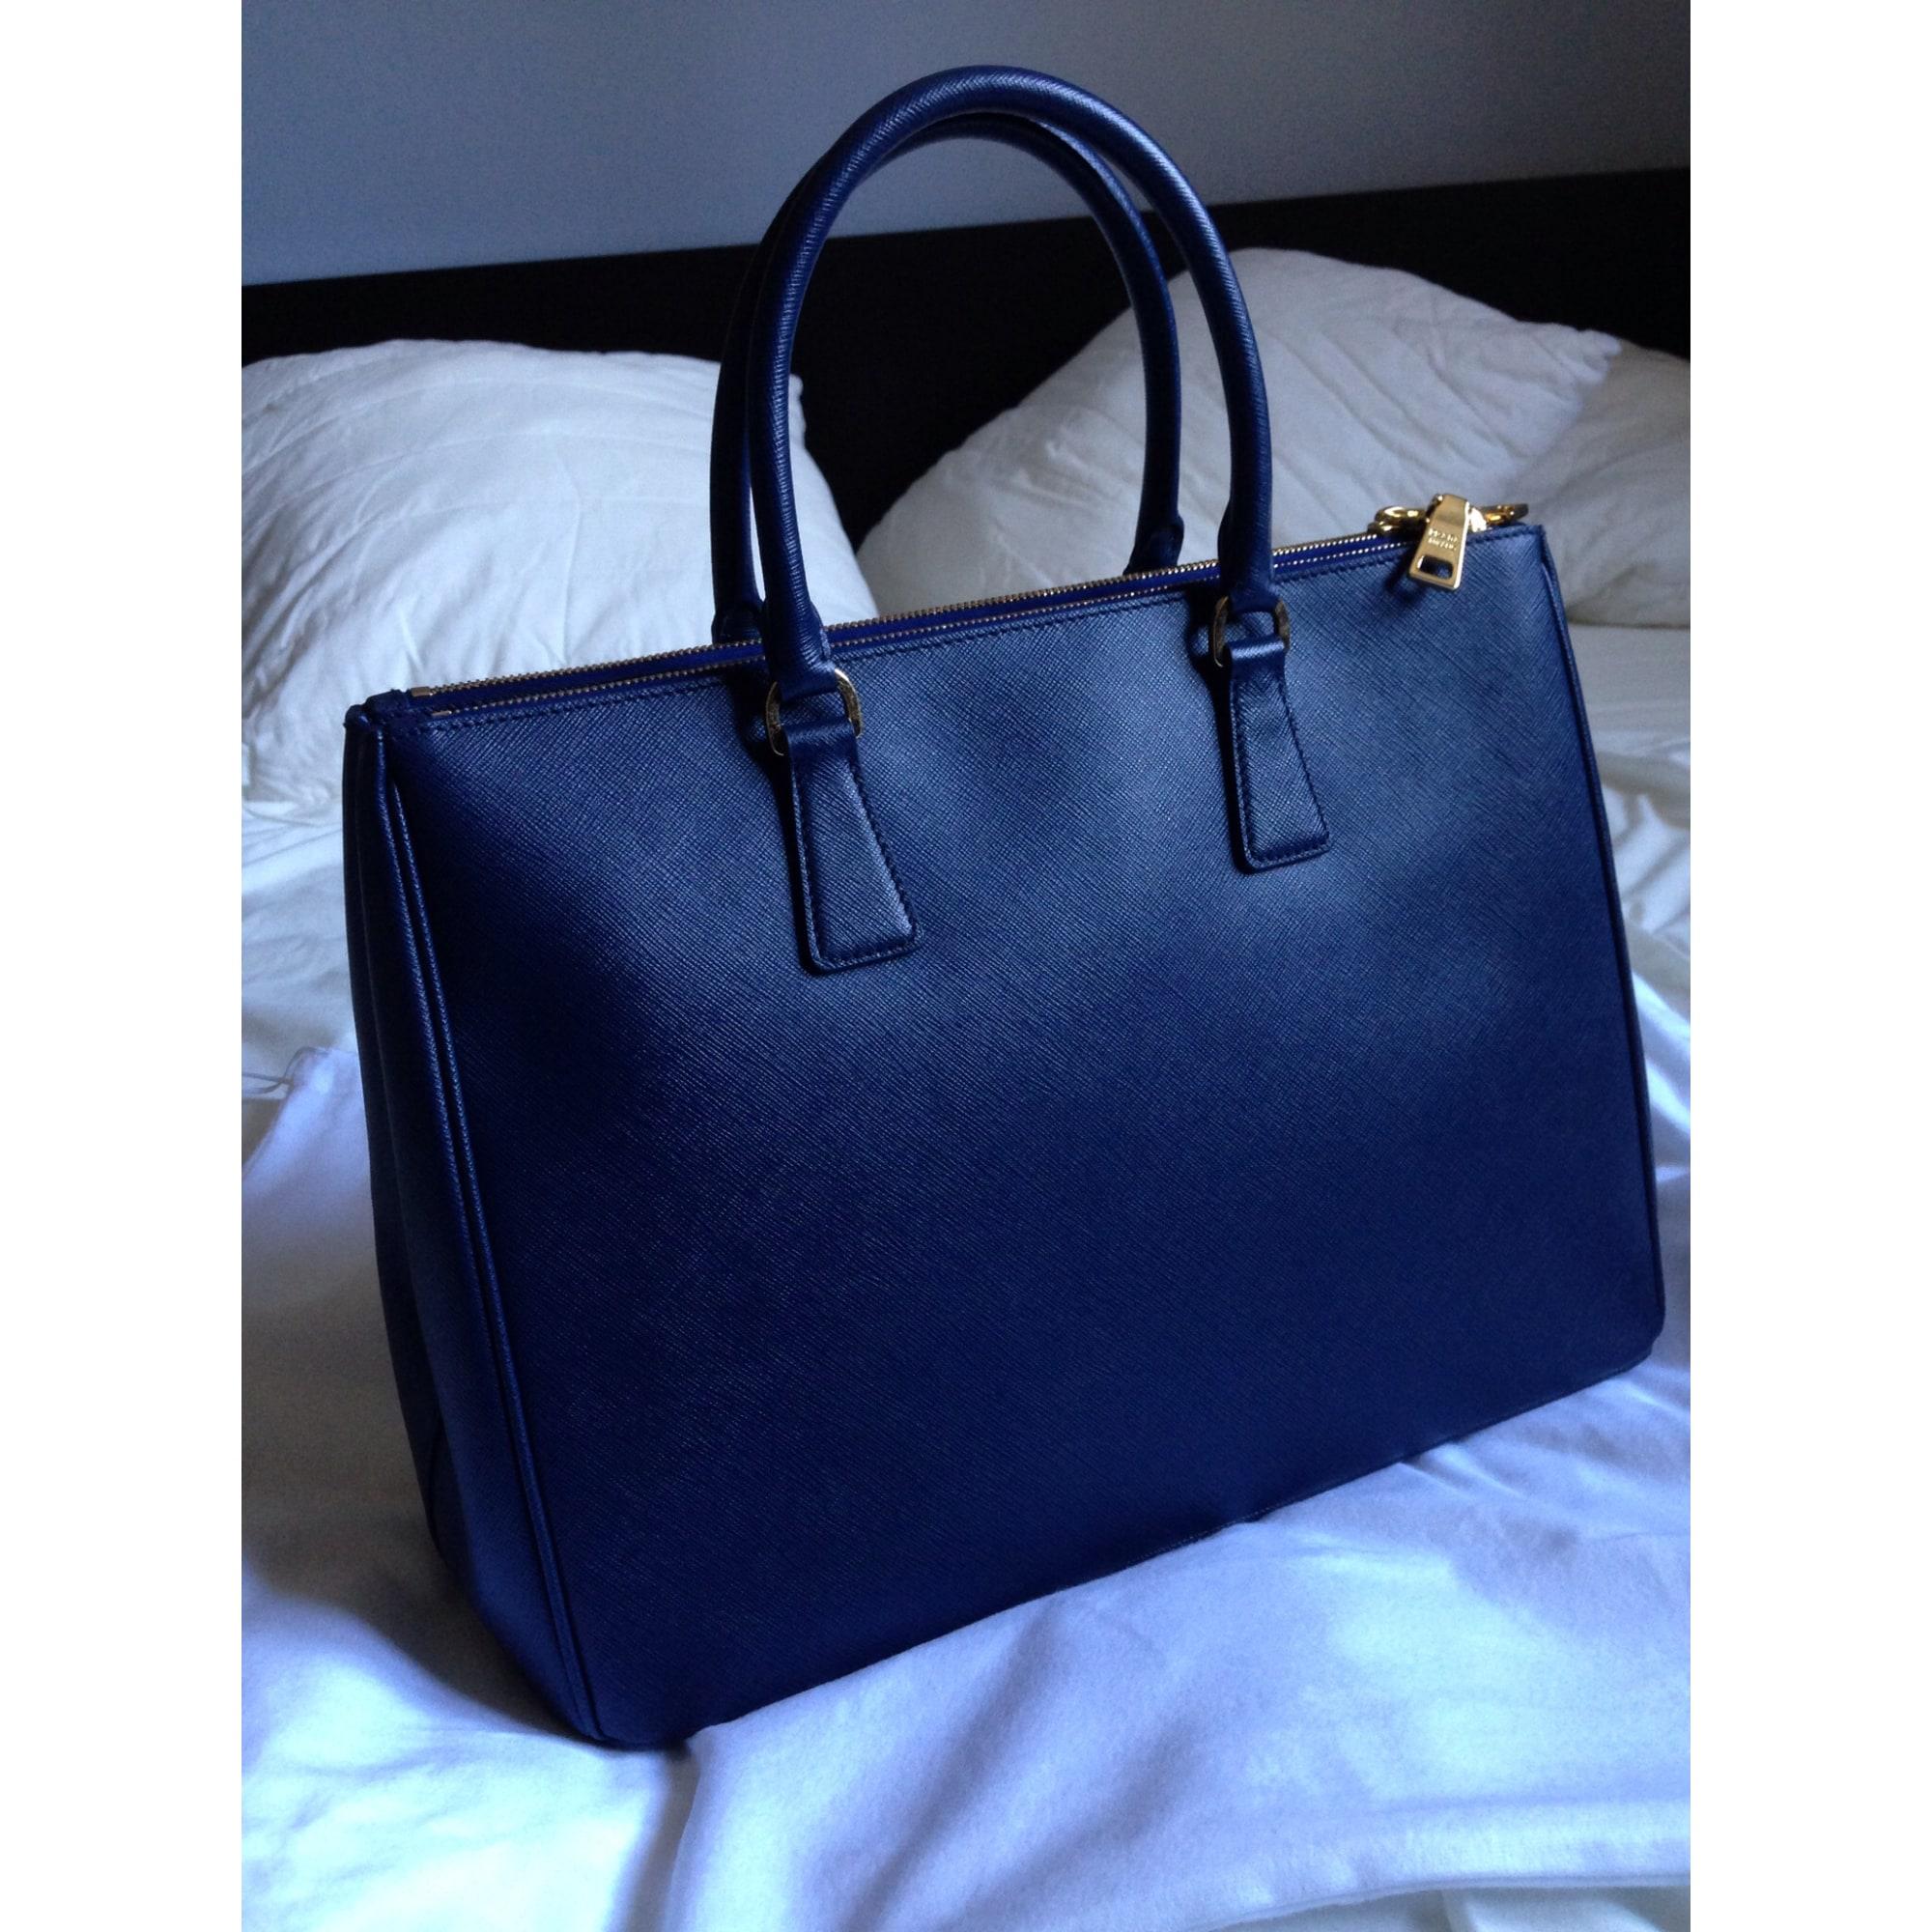 Sac à main en cuir PRADA bleu vendu par Qwartergirl511315 - 2098637 68efbcbddb0